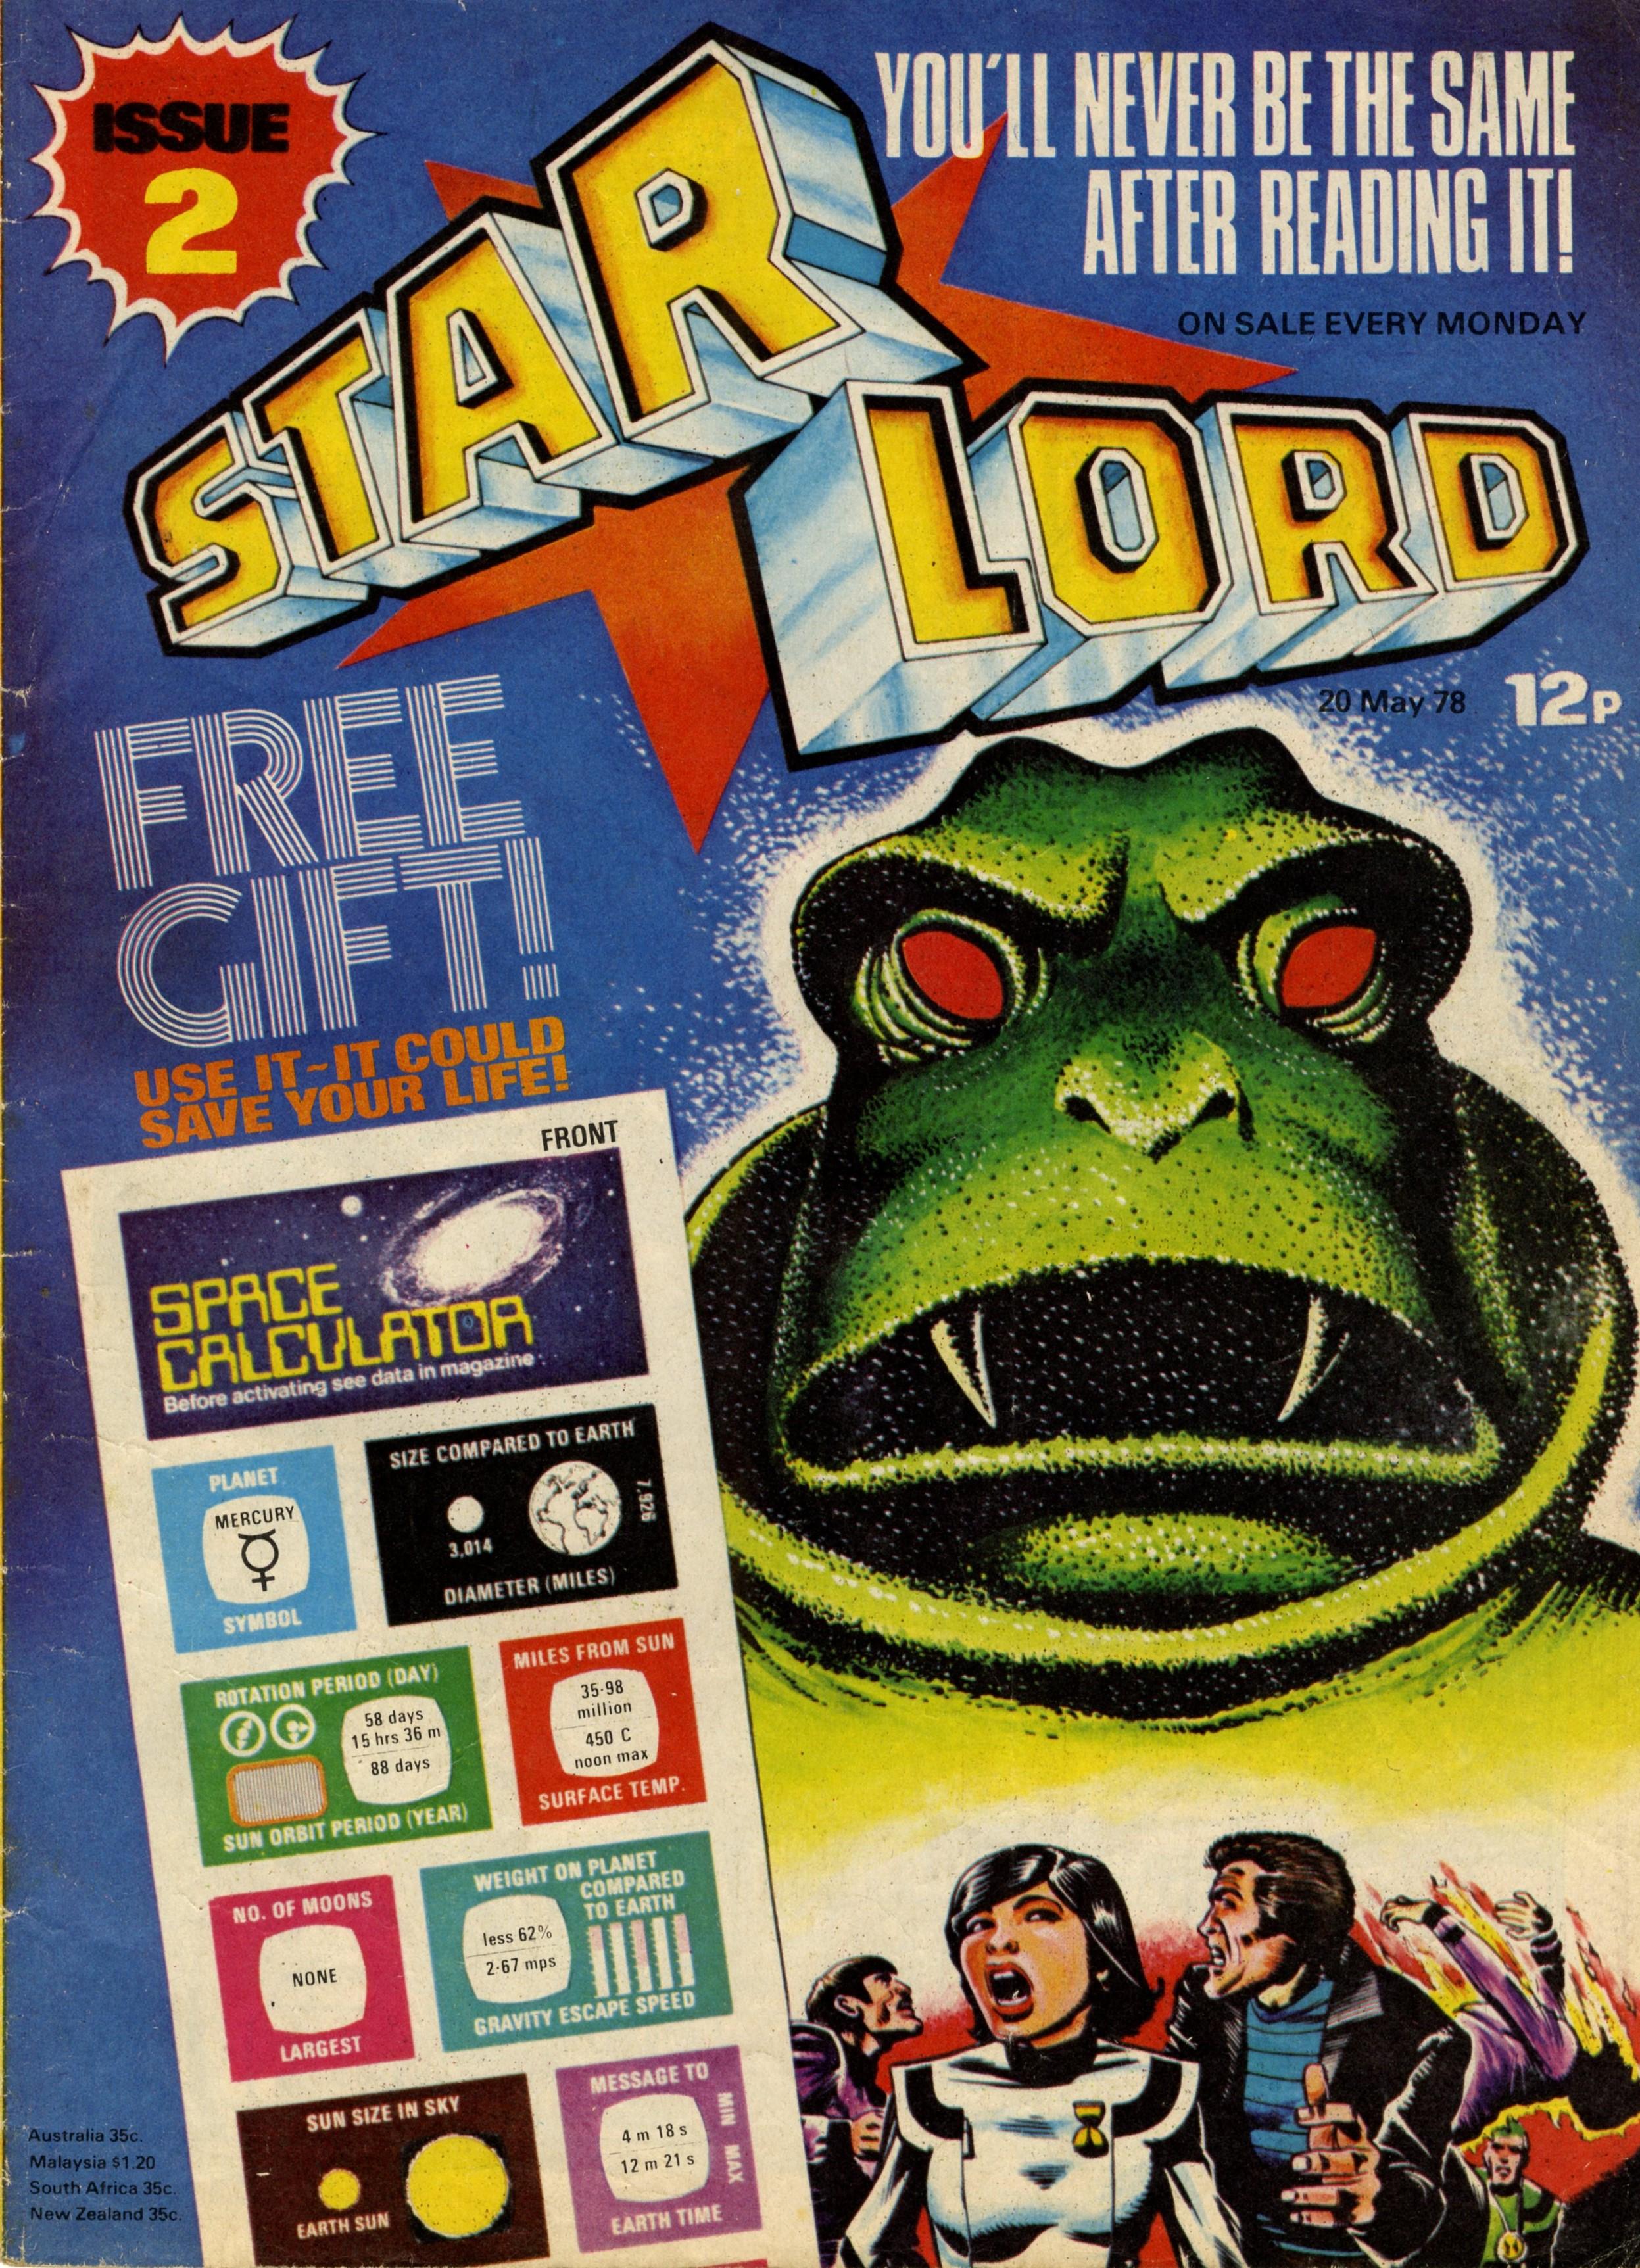 Starlord 200578 001.jpg